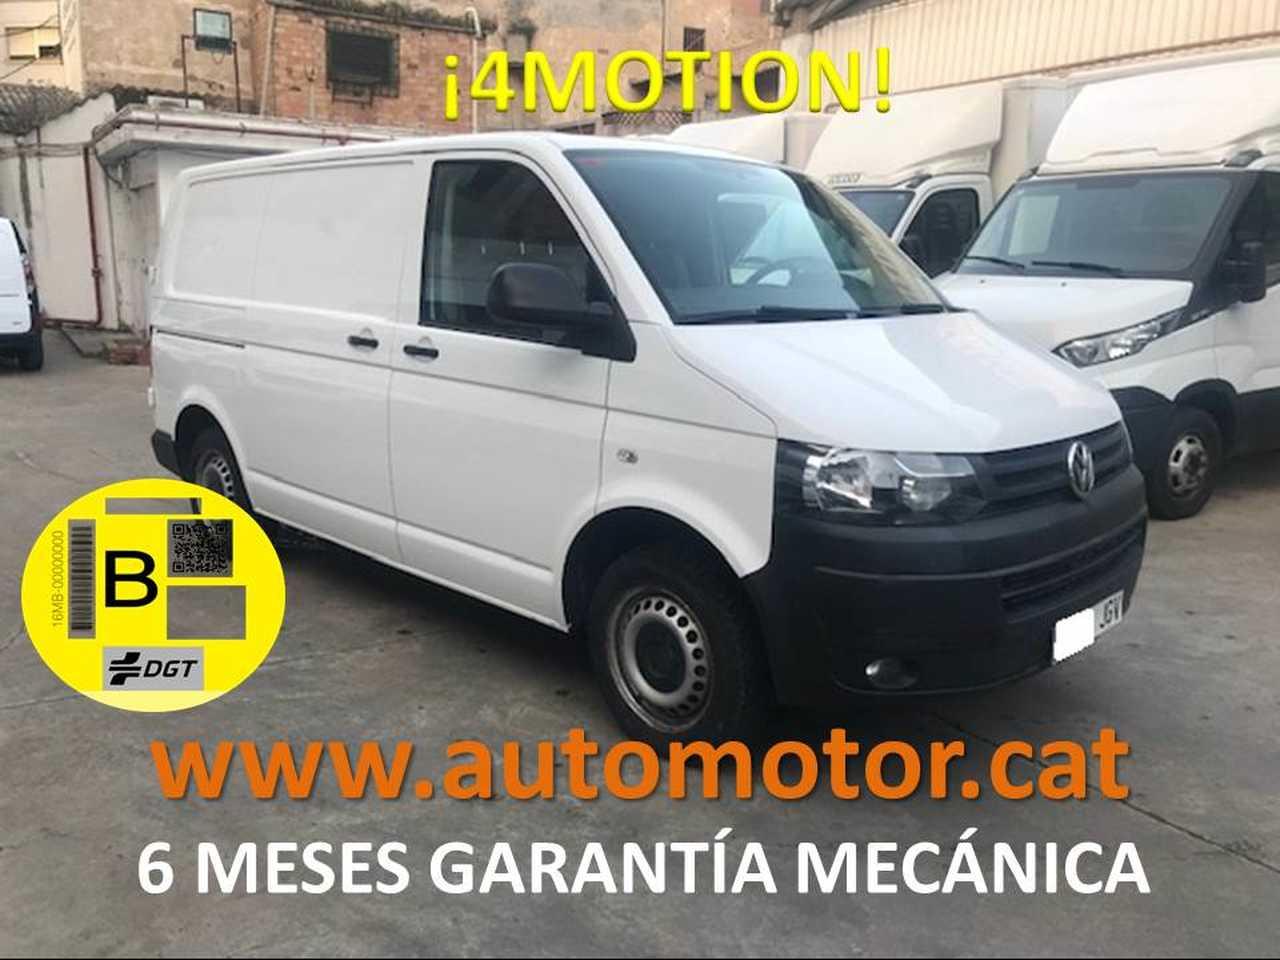 Volkswagen Transporter 2.0TDIBMT 4M Corto 140cv - GARANTIA MECANICA  - Foto 1